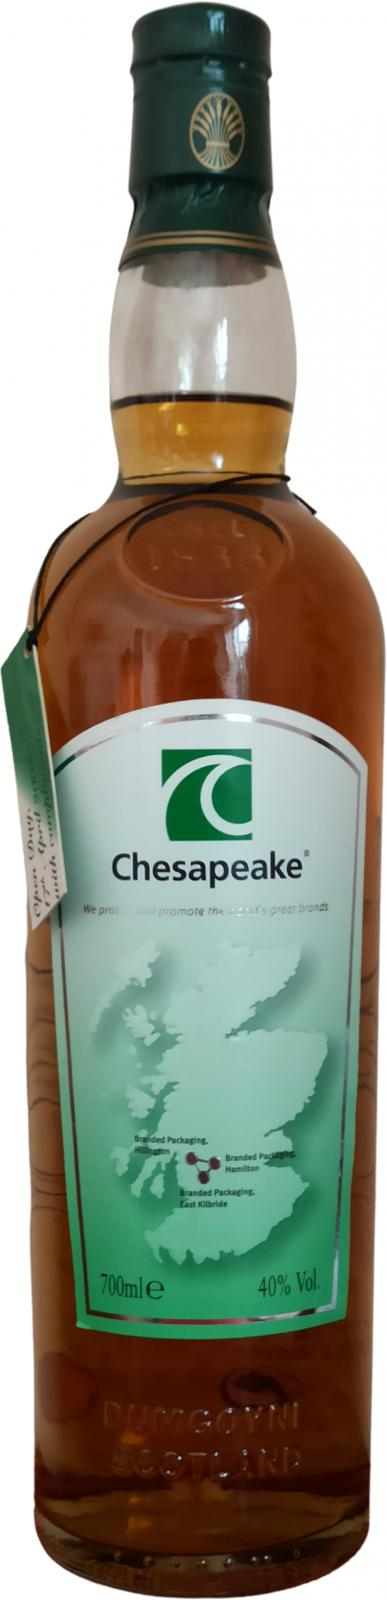 Glengoyne Chesapeake